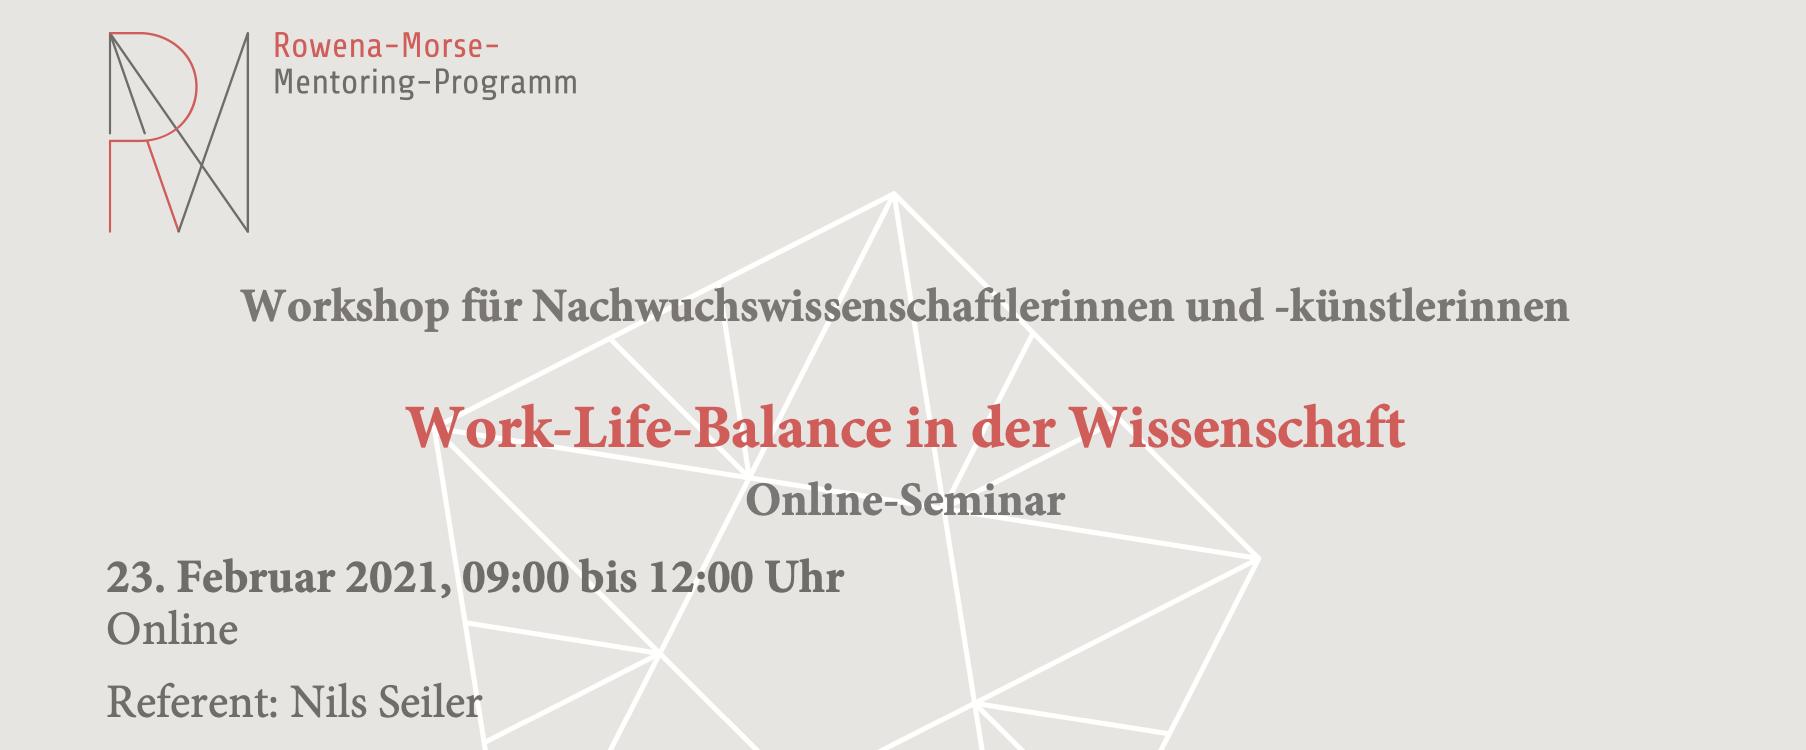 RMMP: Workshop zu Work-Life-Balance